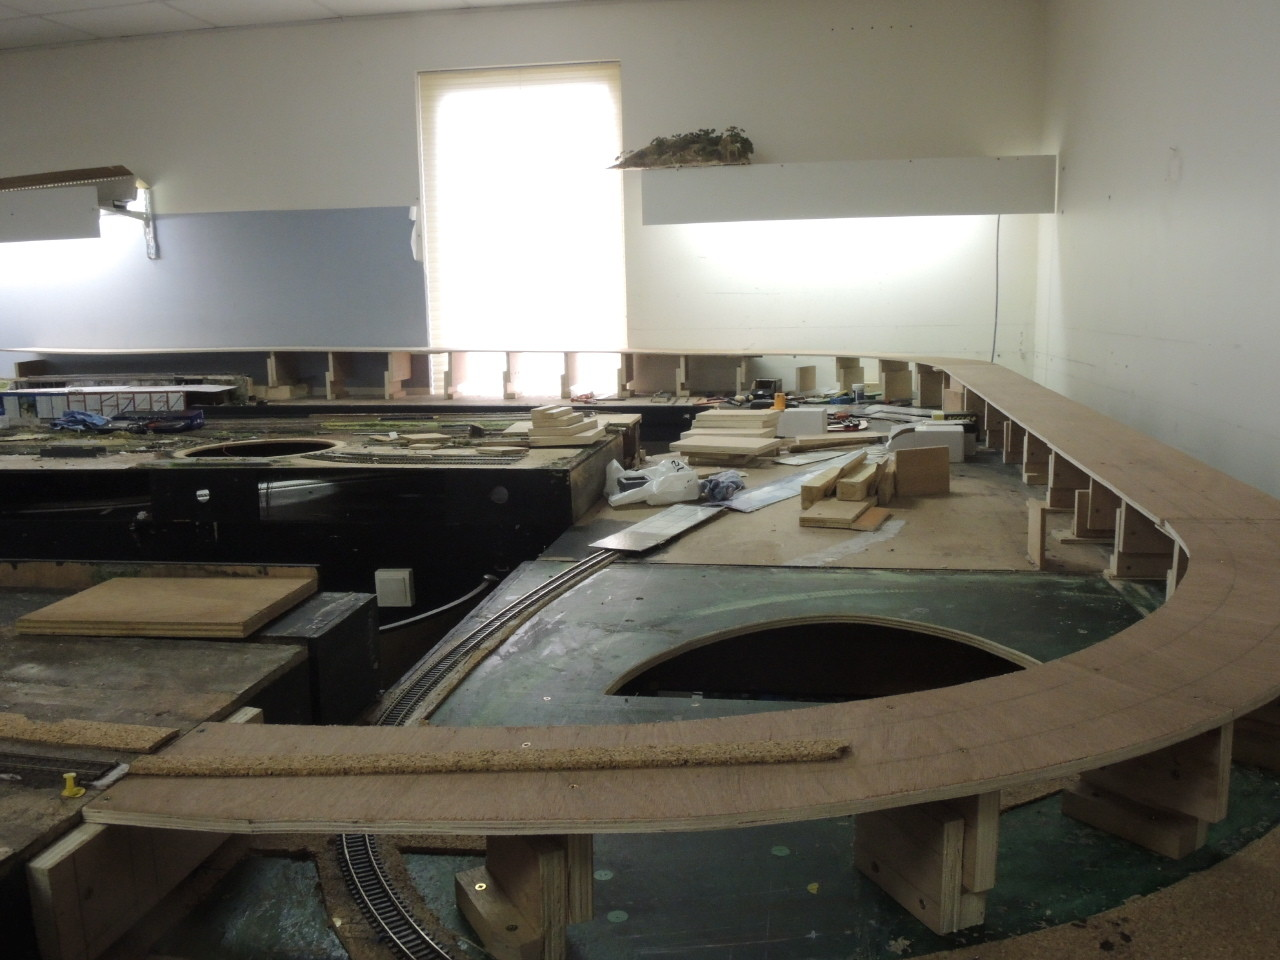 Sortie de la gare de Mer avec une rampe en pente de 1 à 2 cm/M